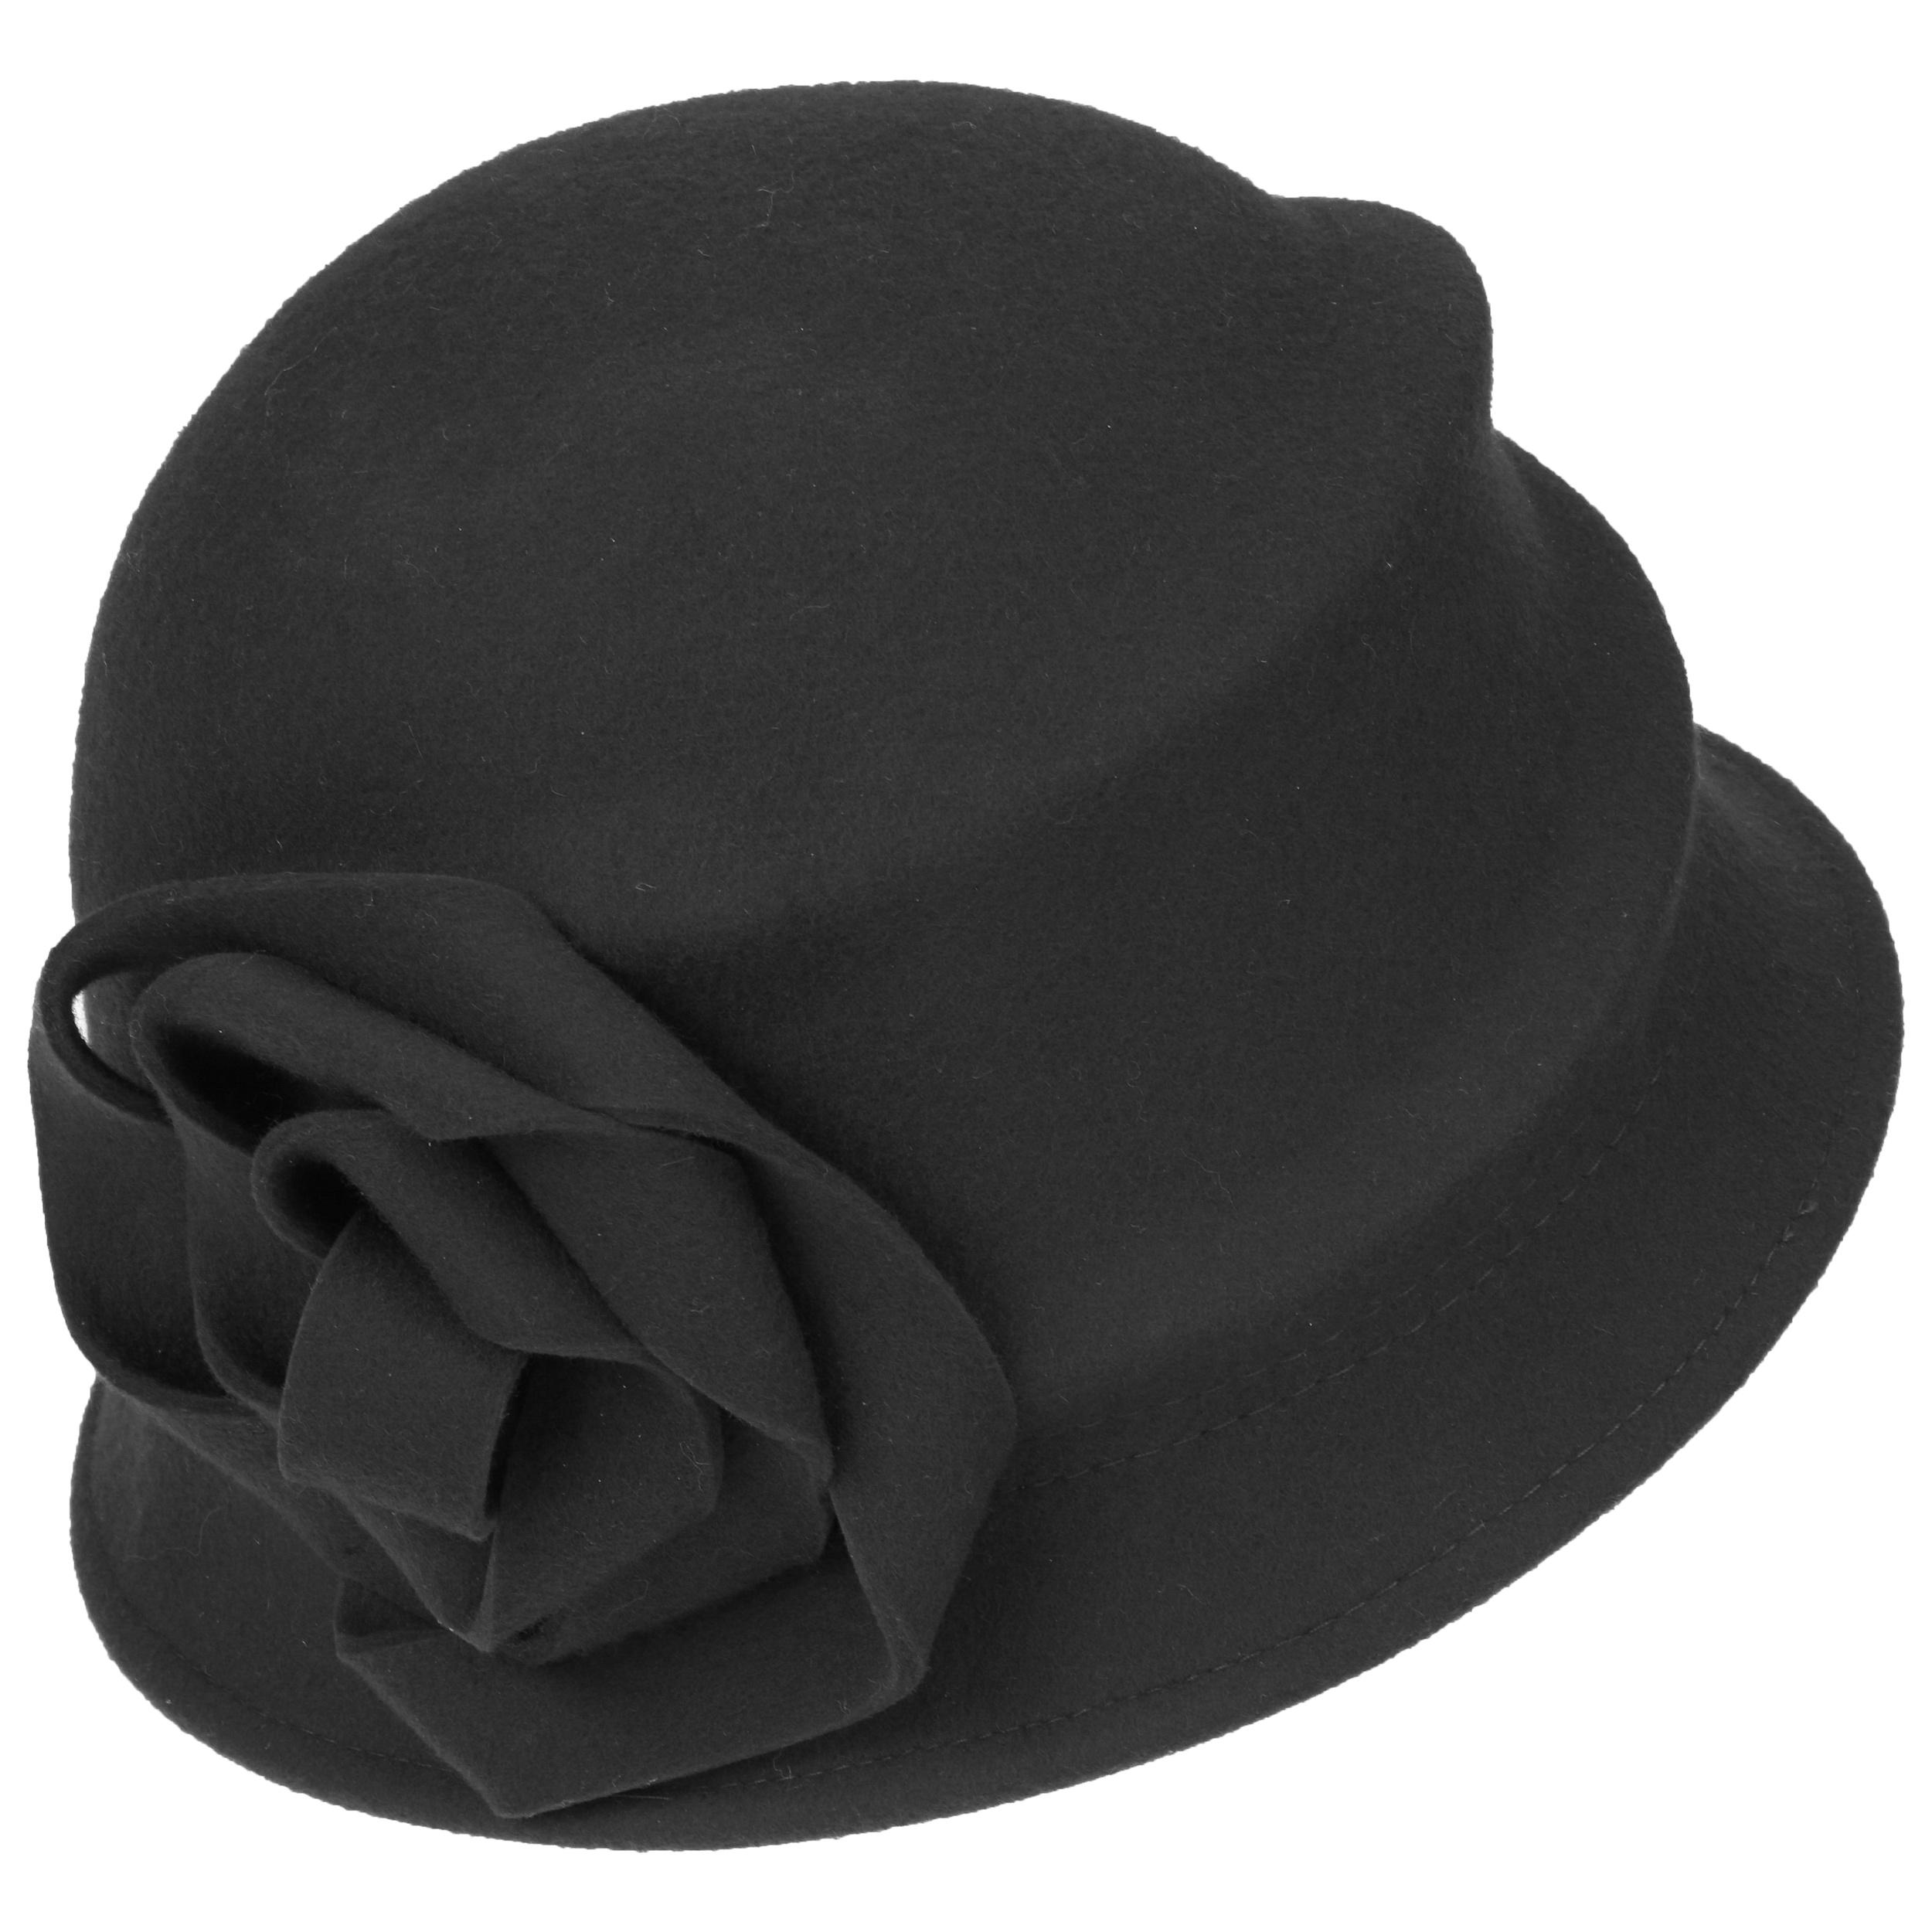 b3838a6833eaf ... Alexandrite Wool Felt Cloche Hat by Betmar - black 1 ...